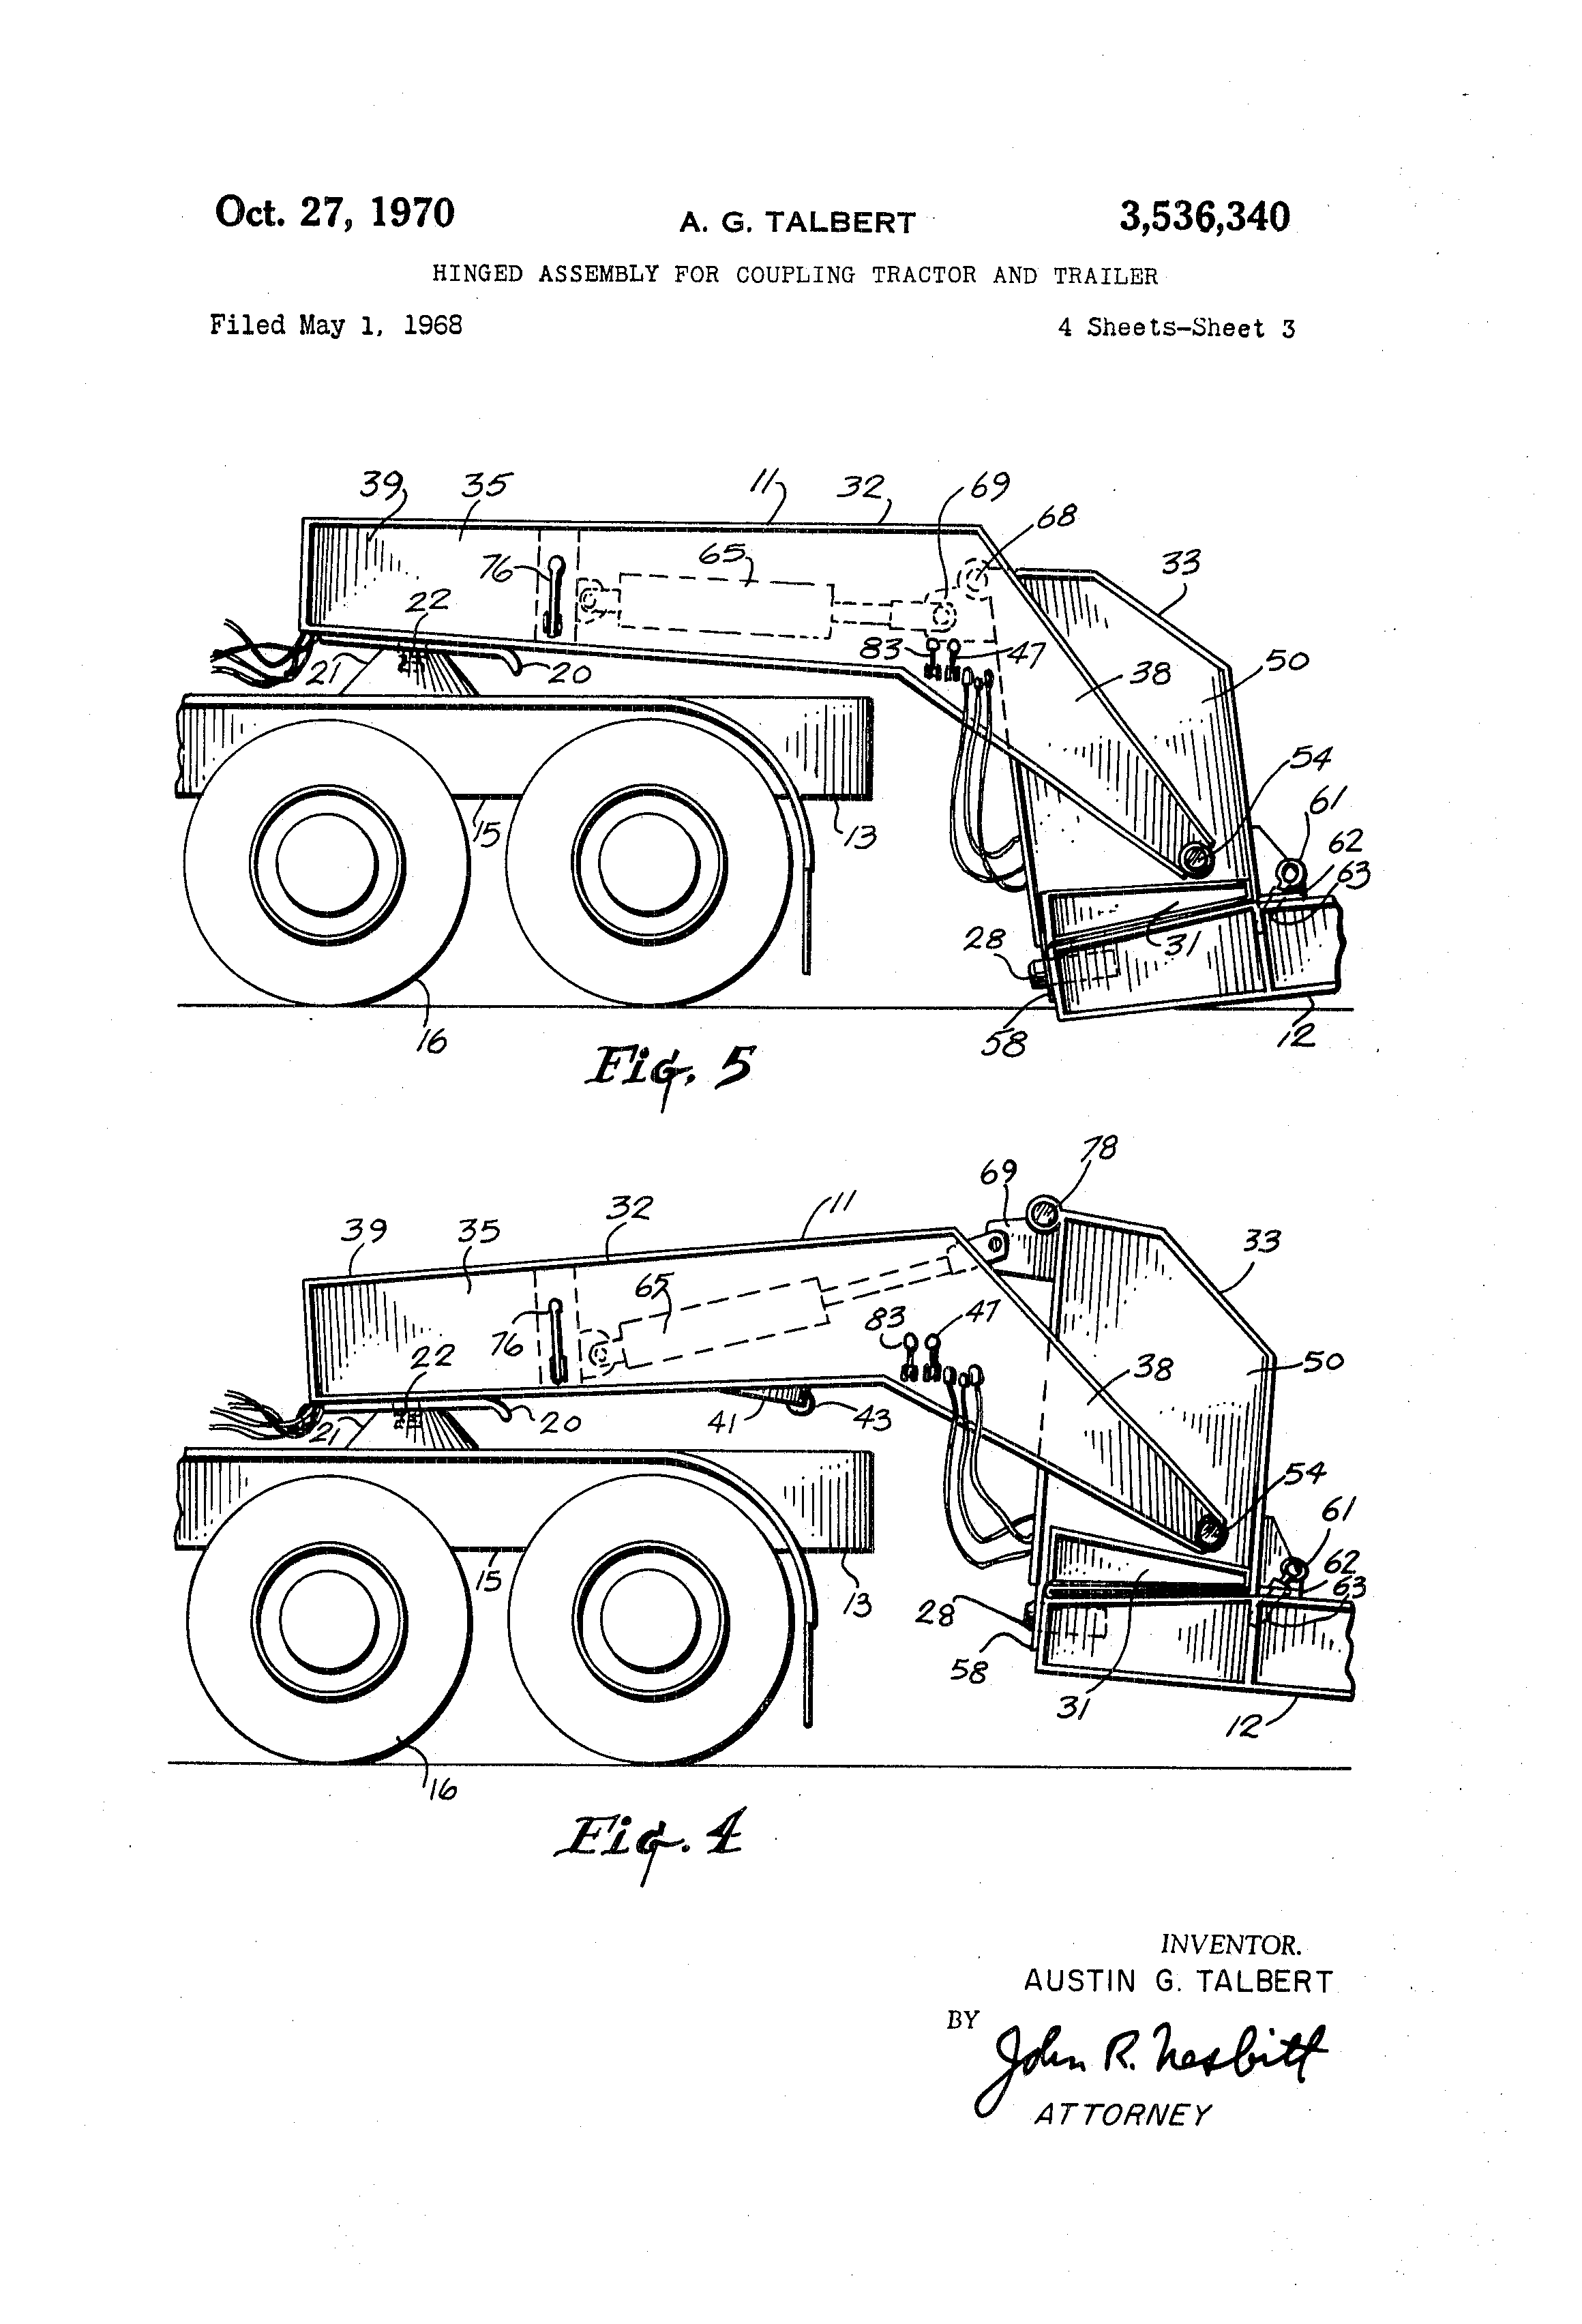 removable gooseneck trailer structure